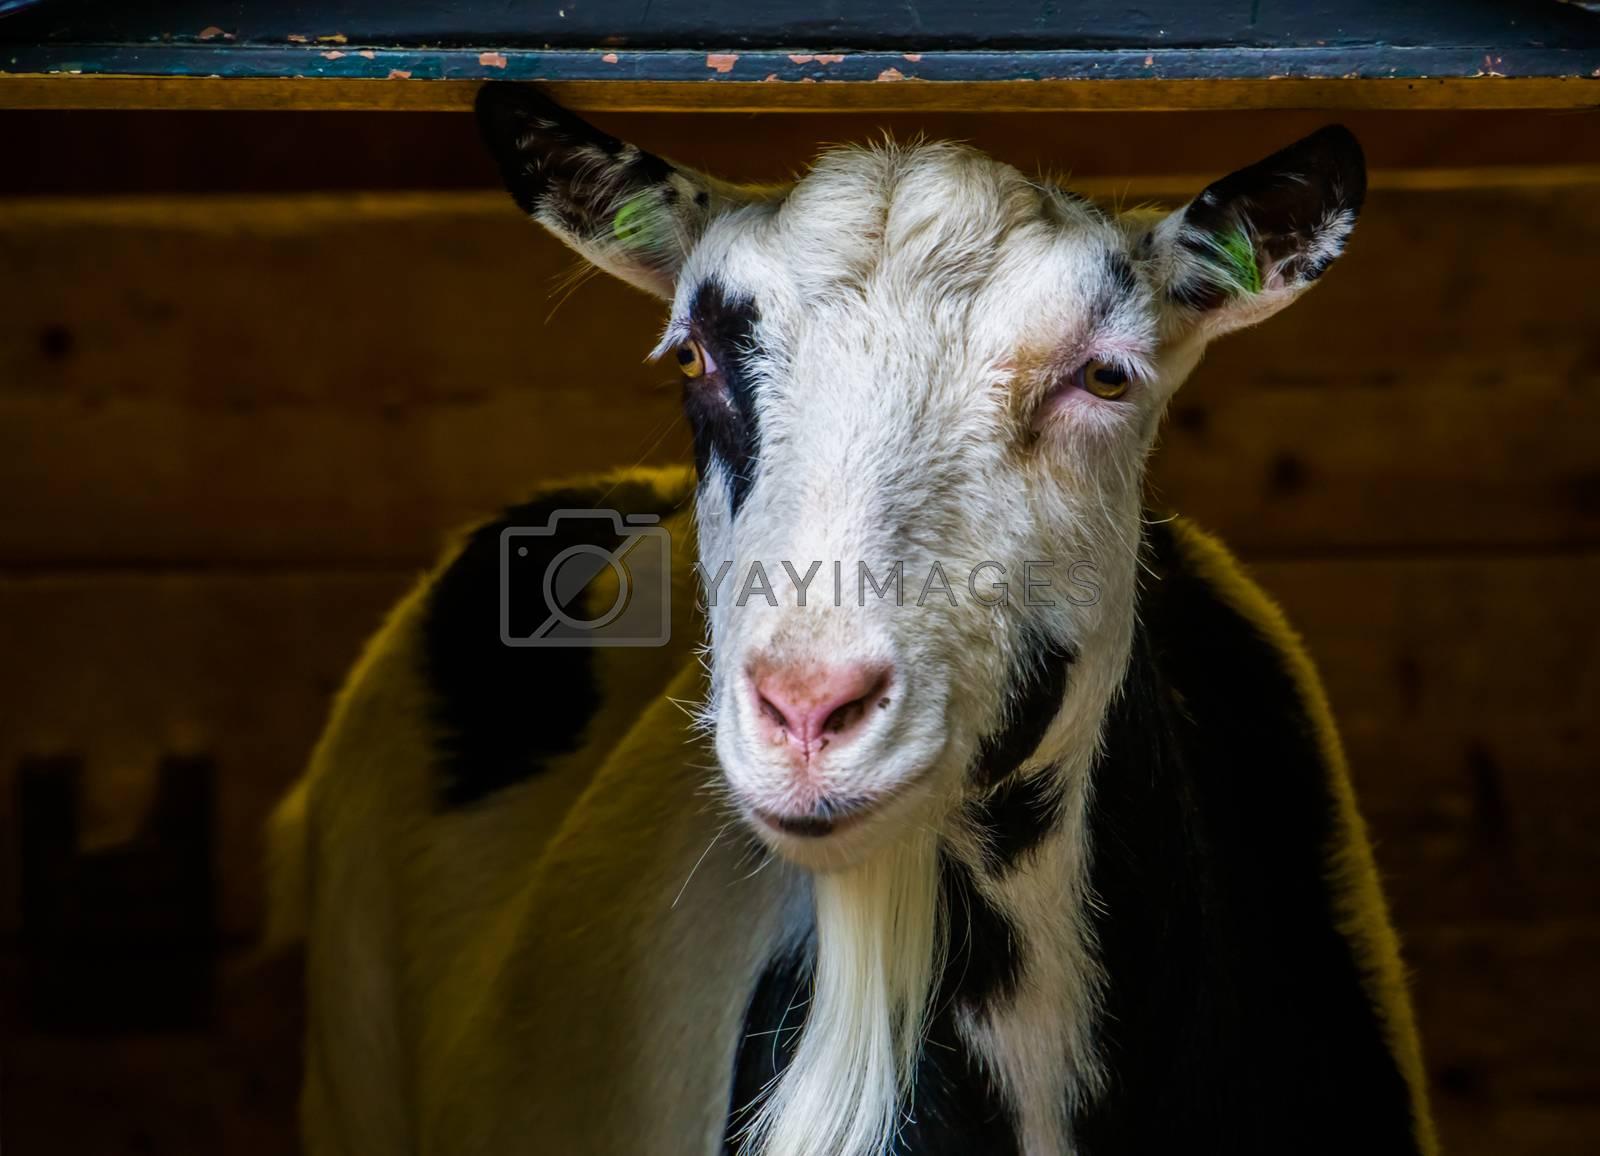 closeup portrait of a domestic goat, Adorable farm animal, popular pet